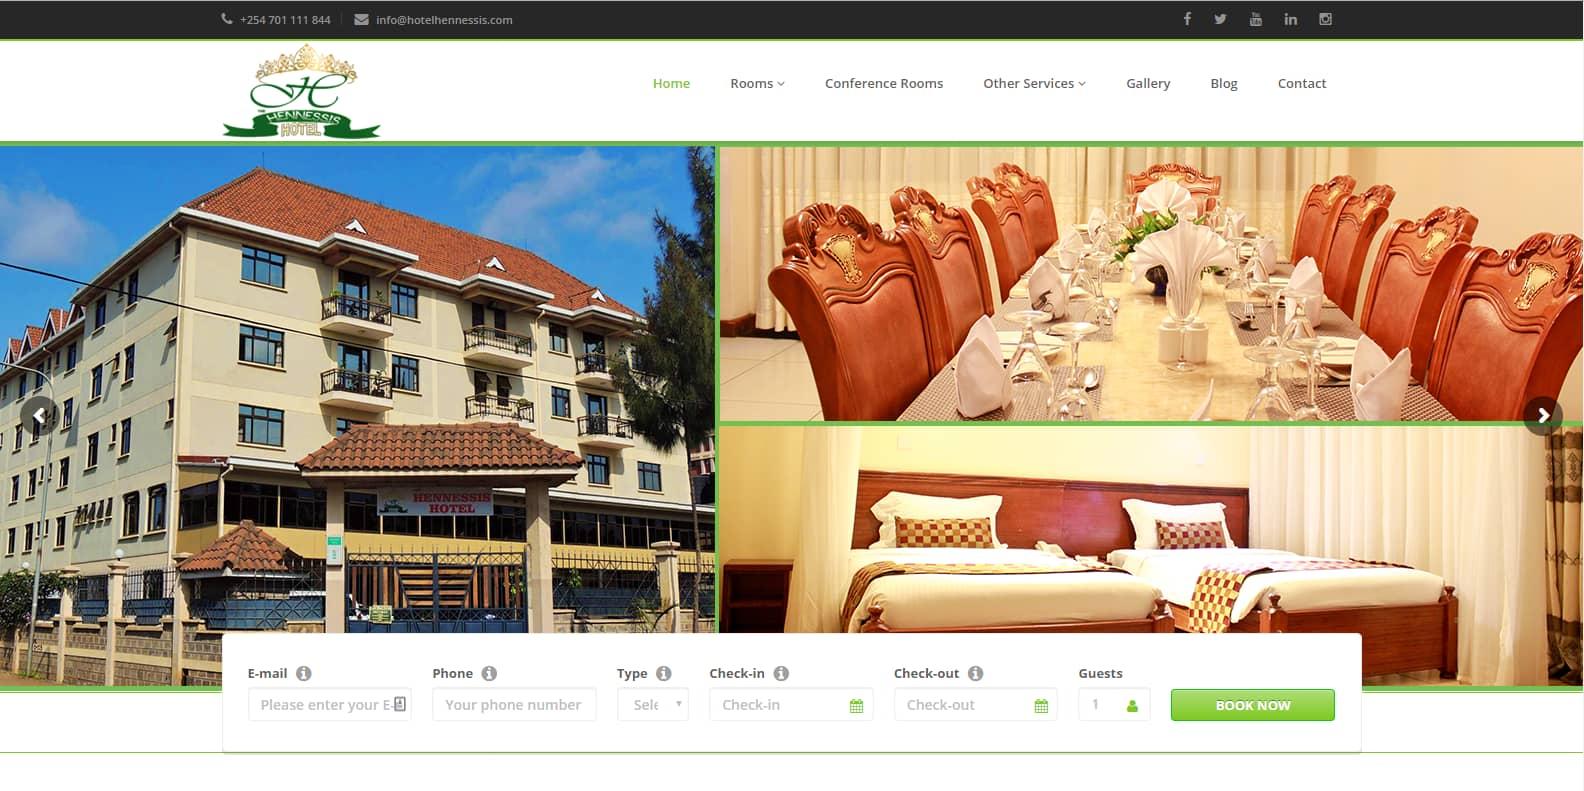 https://tdsmarketers.com/wp-content/uploads/2015/06/Hotel-Hennessis-Website-Design-Project-Home.png